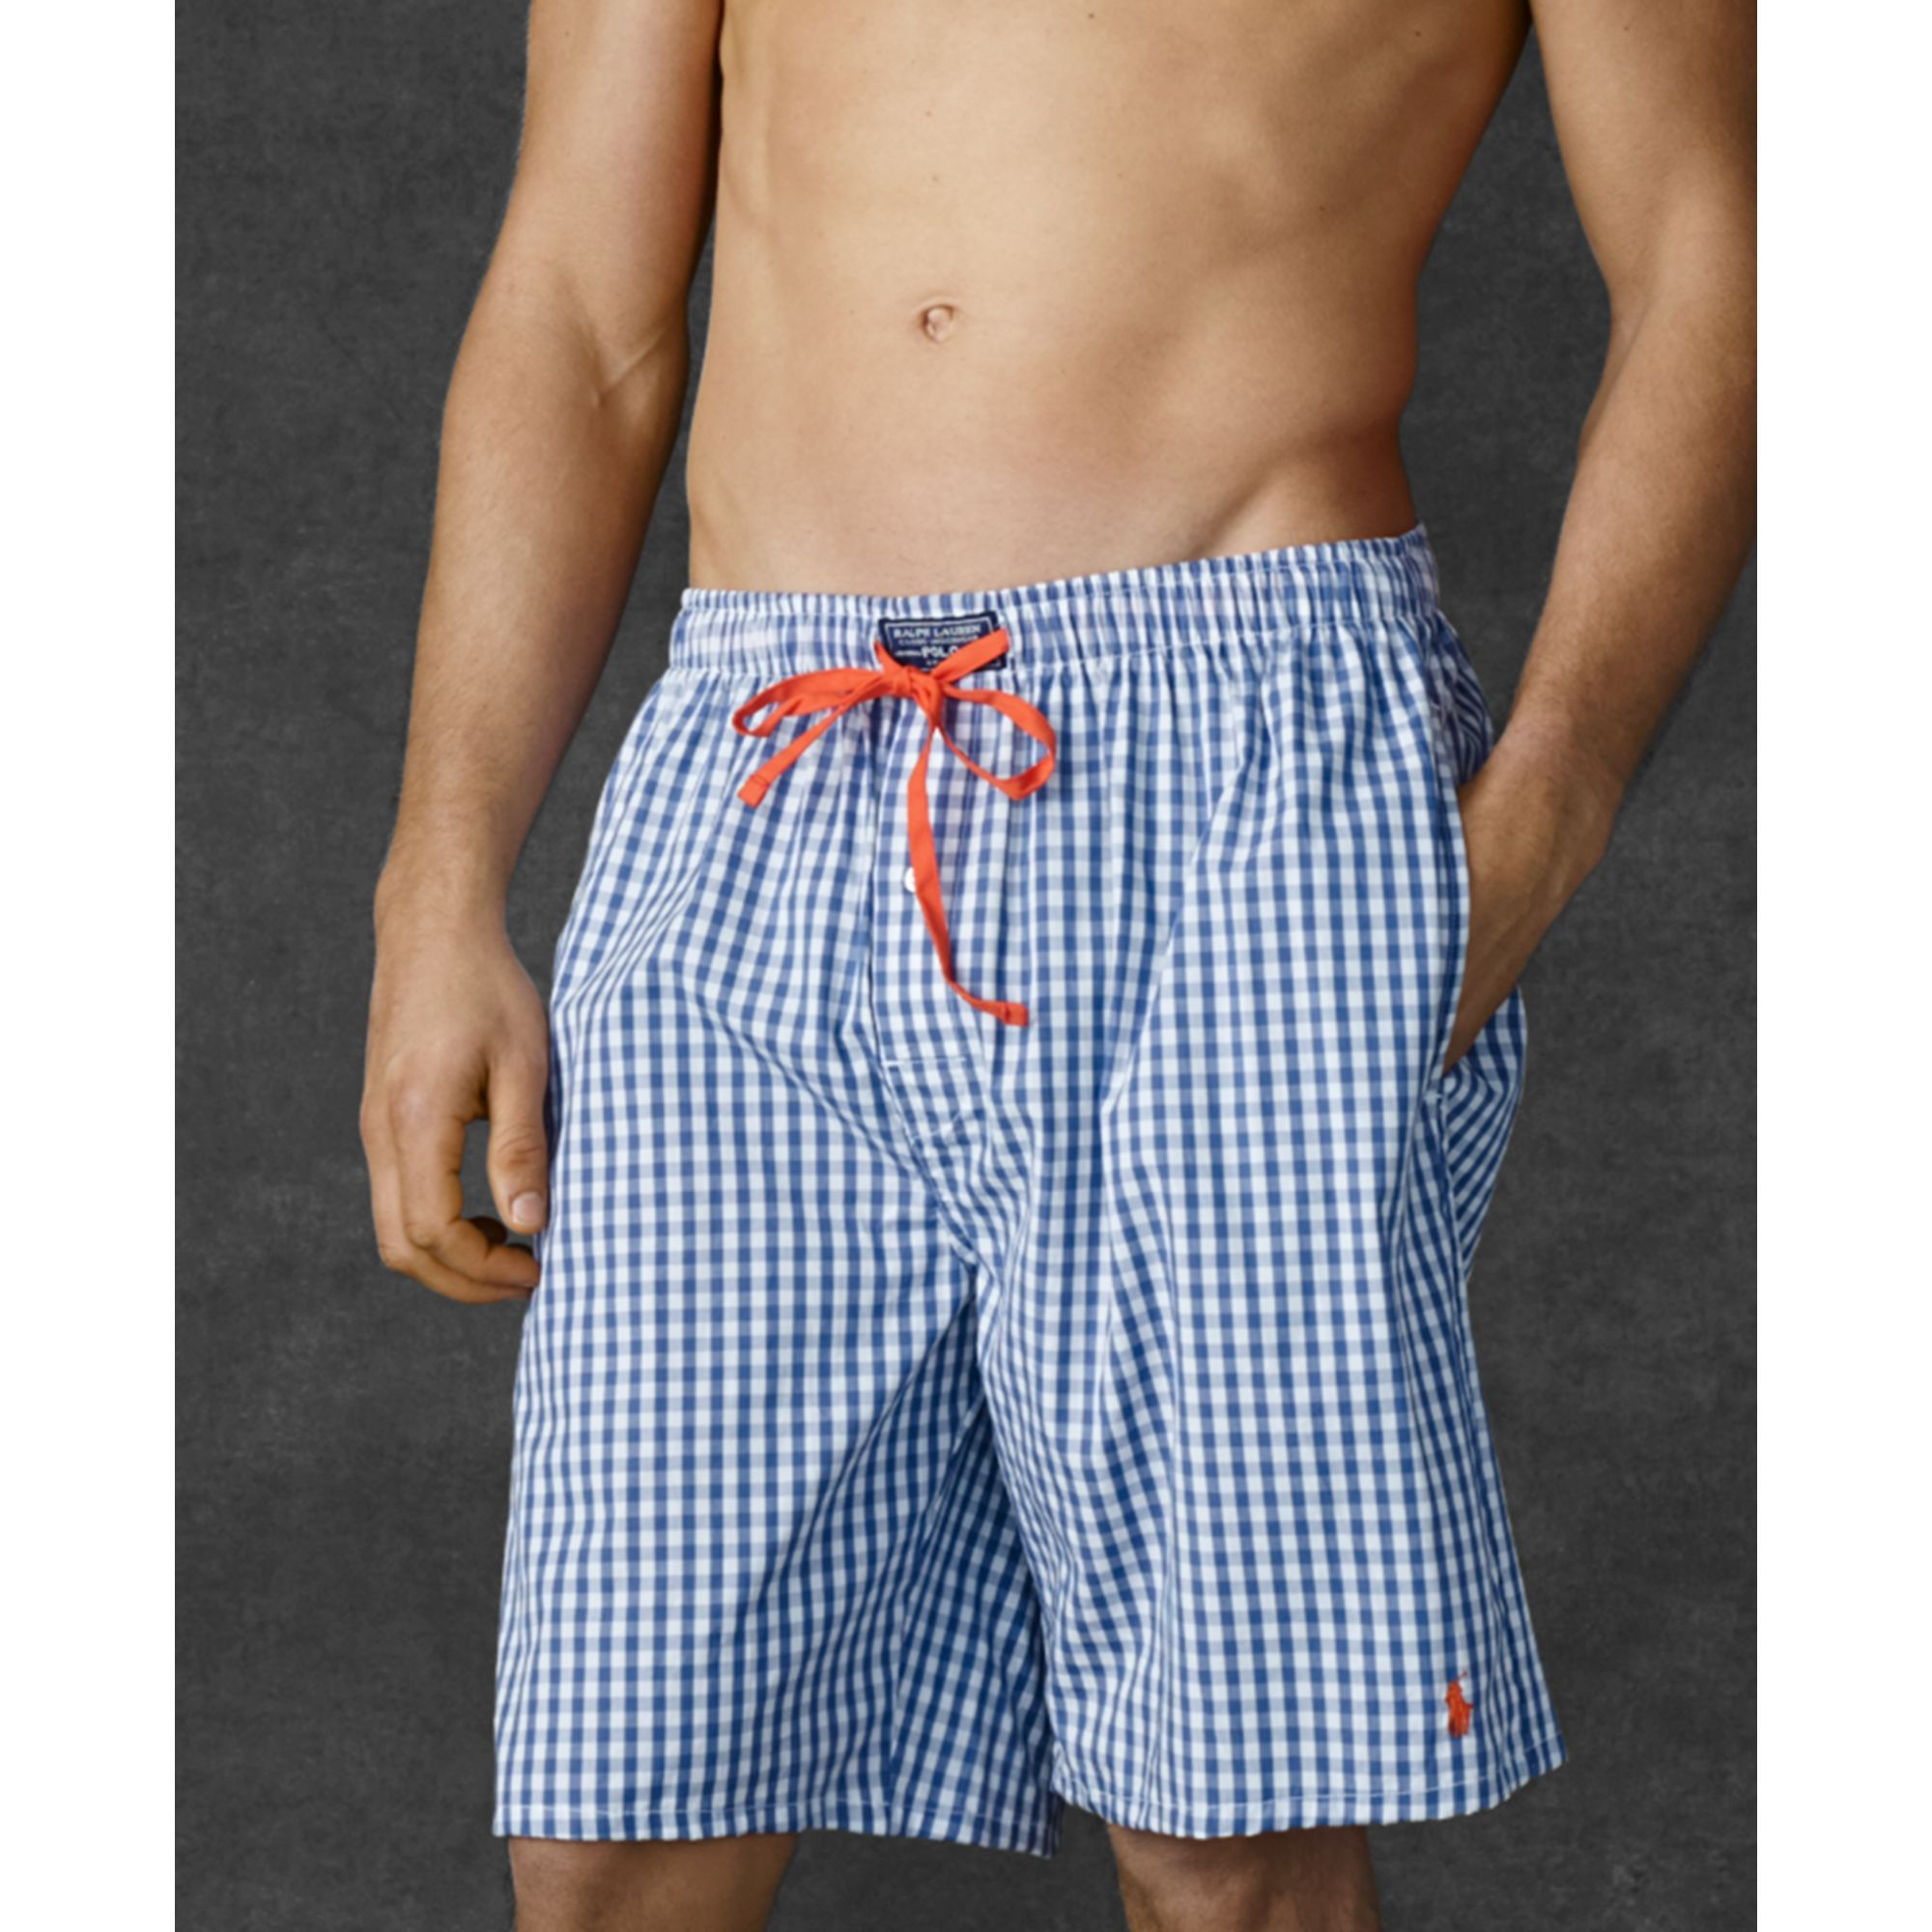 Lyst - Ralph Lauren Polo Mens Gingham Woven Sleep Shorts in Blue for Men 0908de4f4